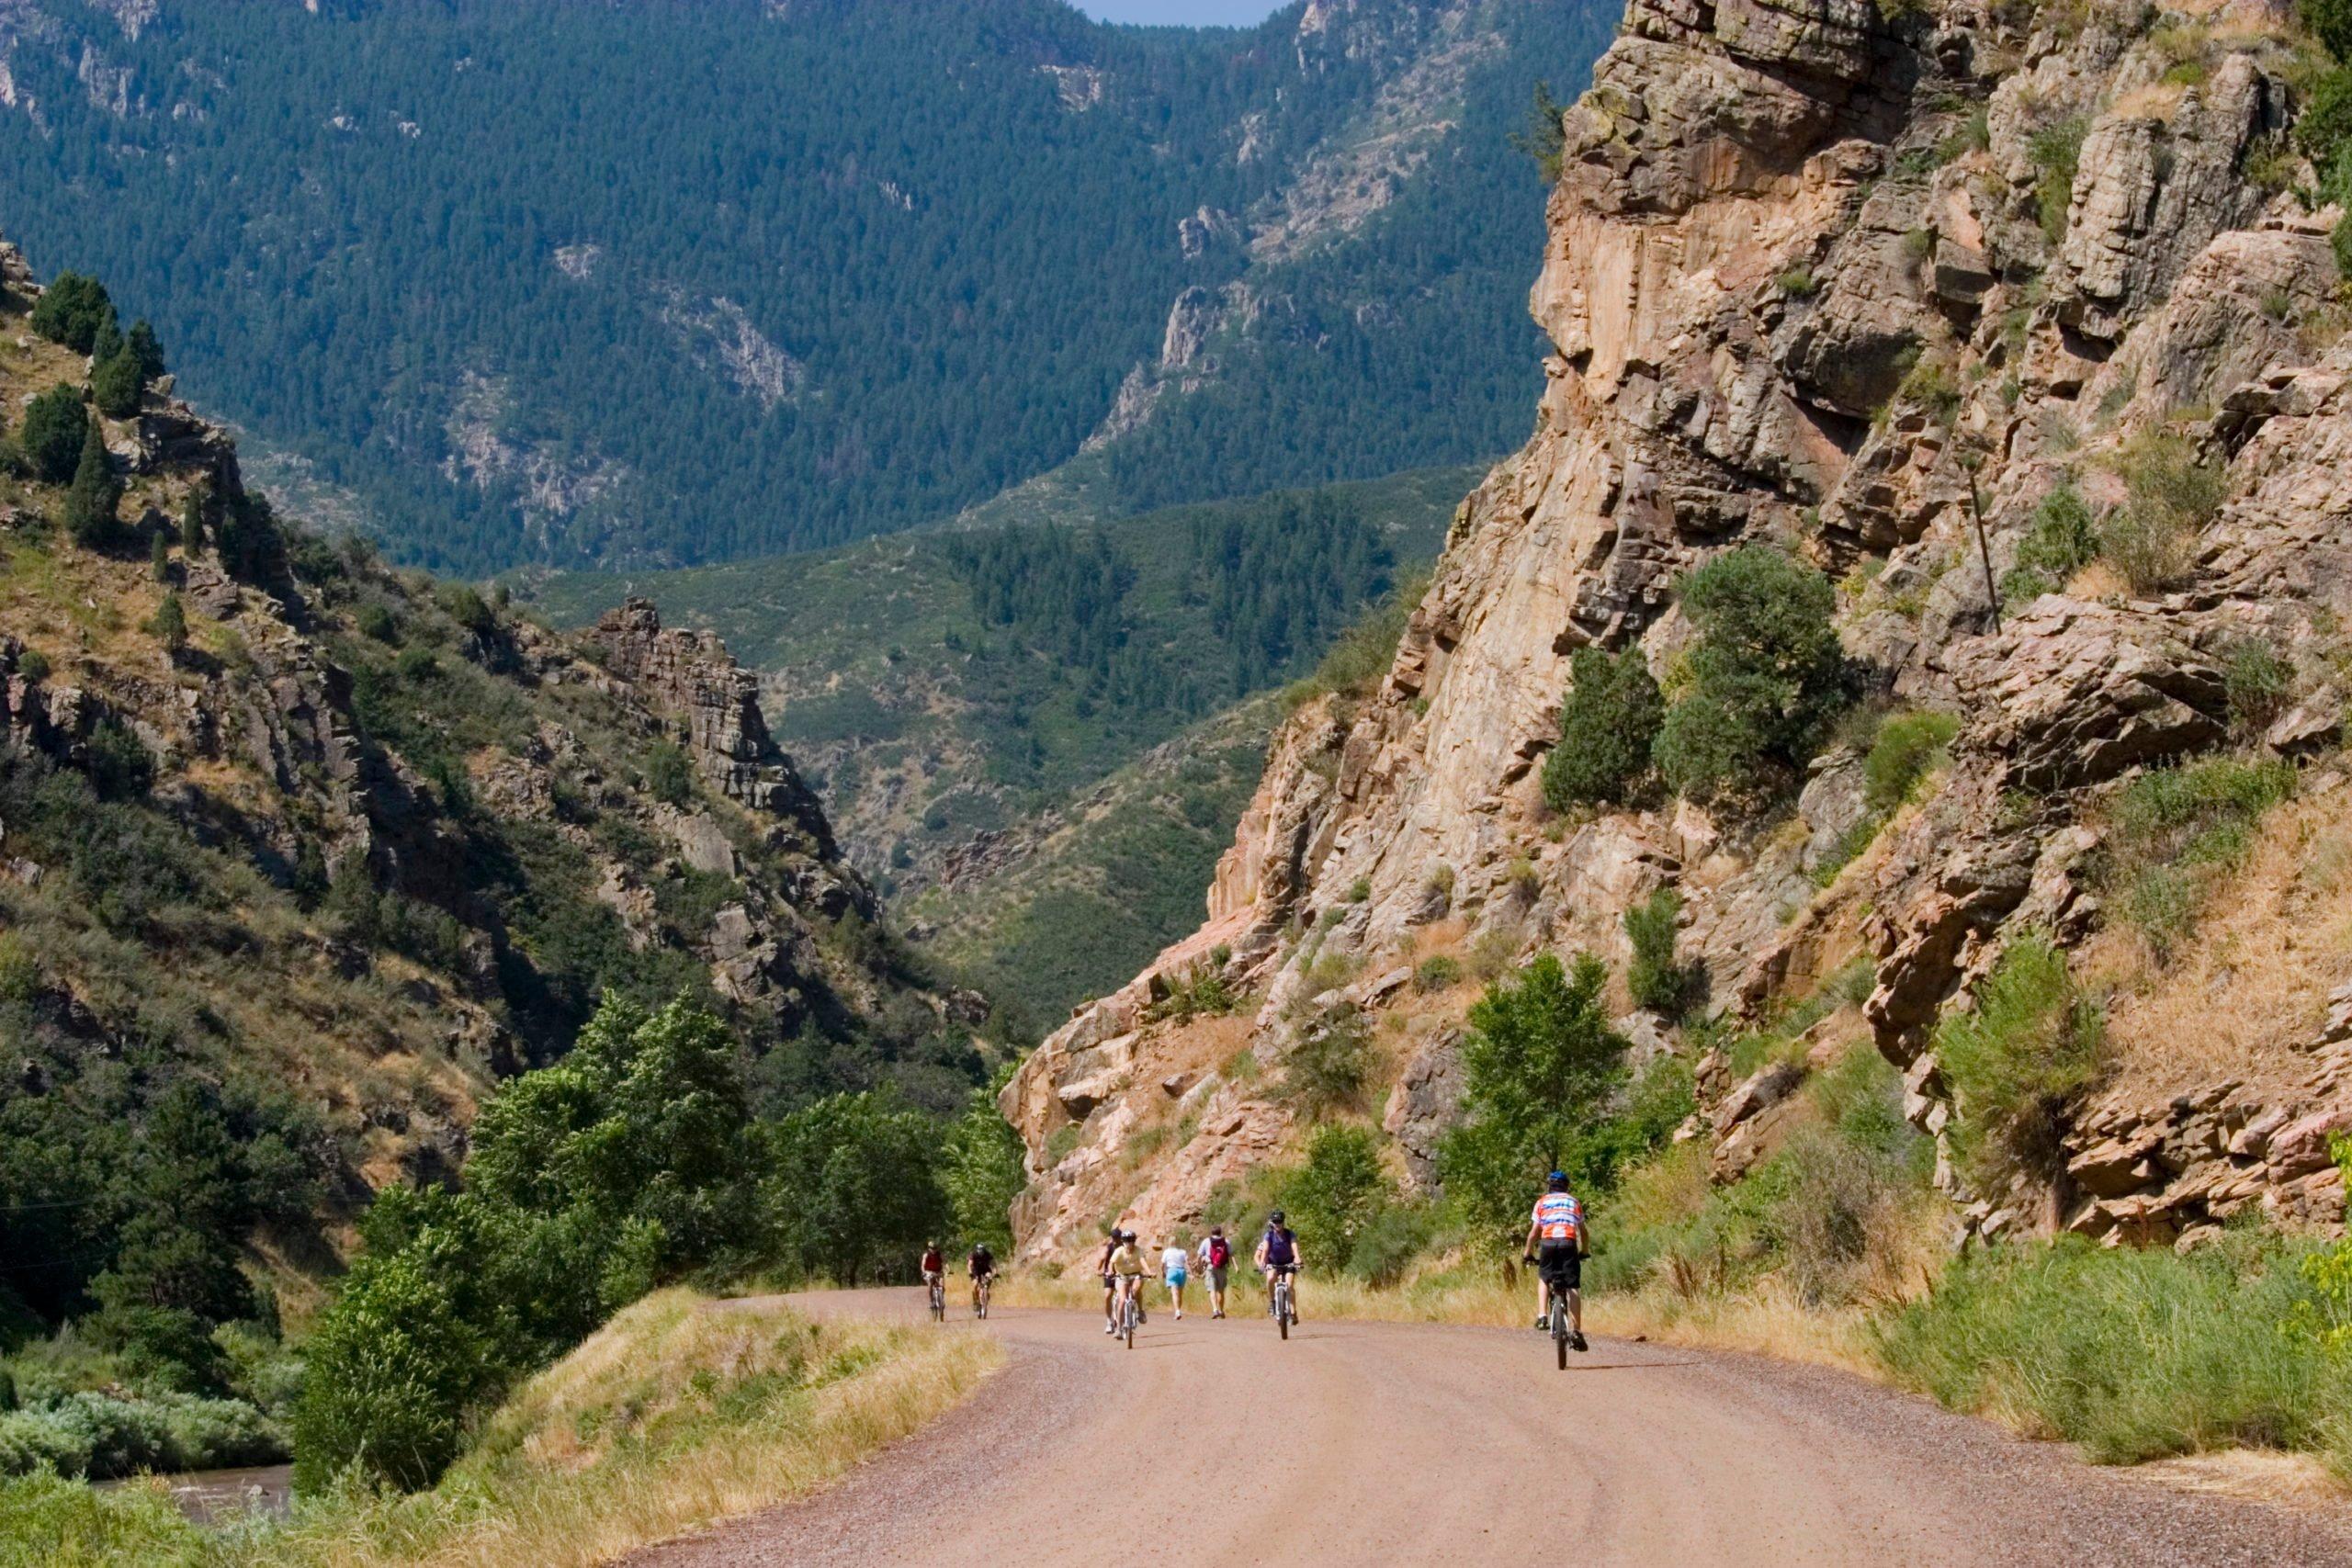 Mountain Bike Riders in Waterton Canyon Colorado